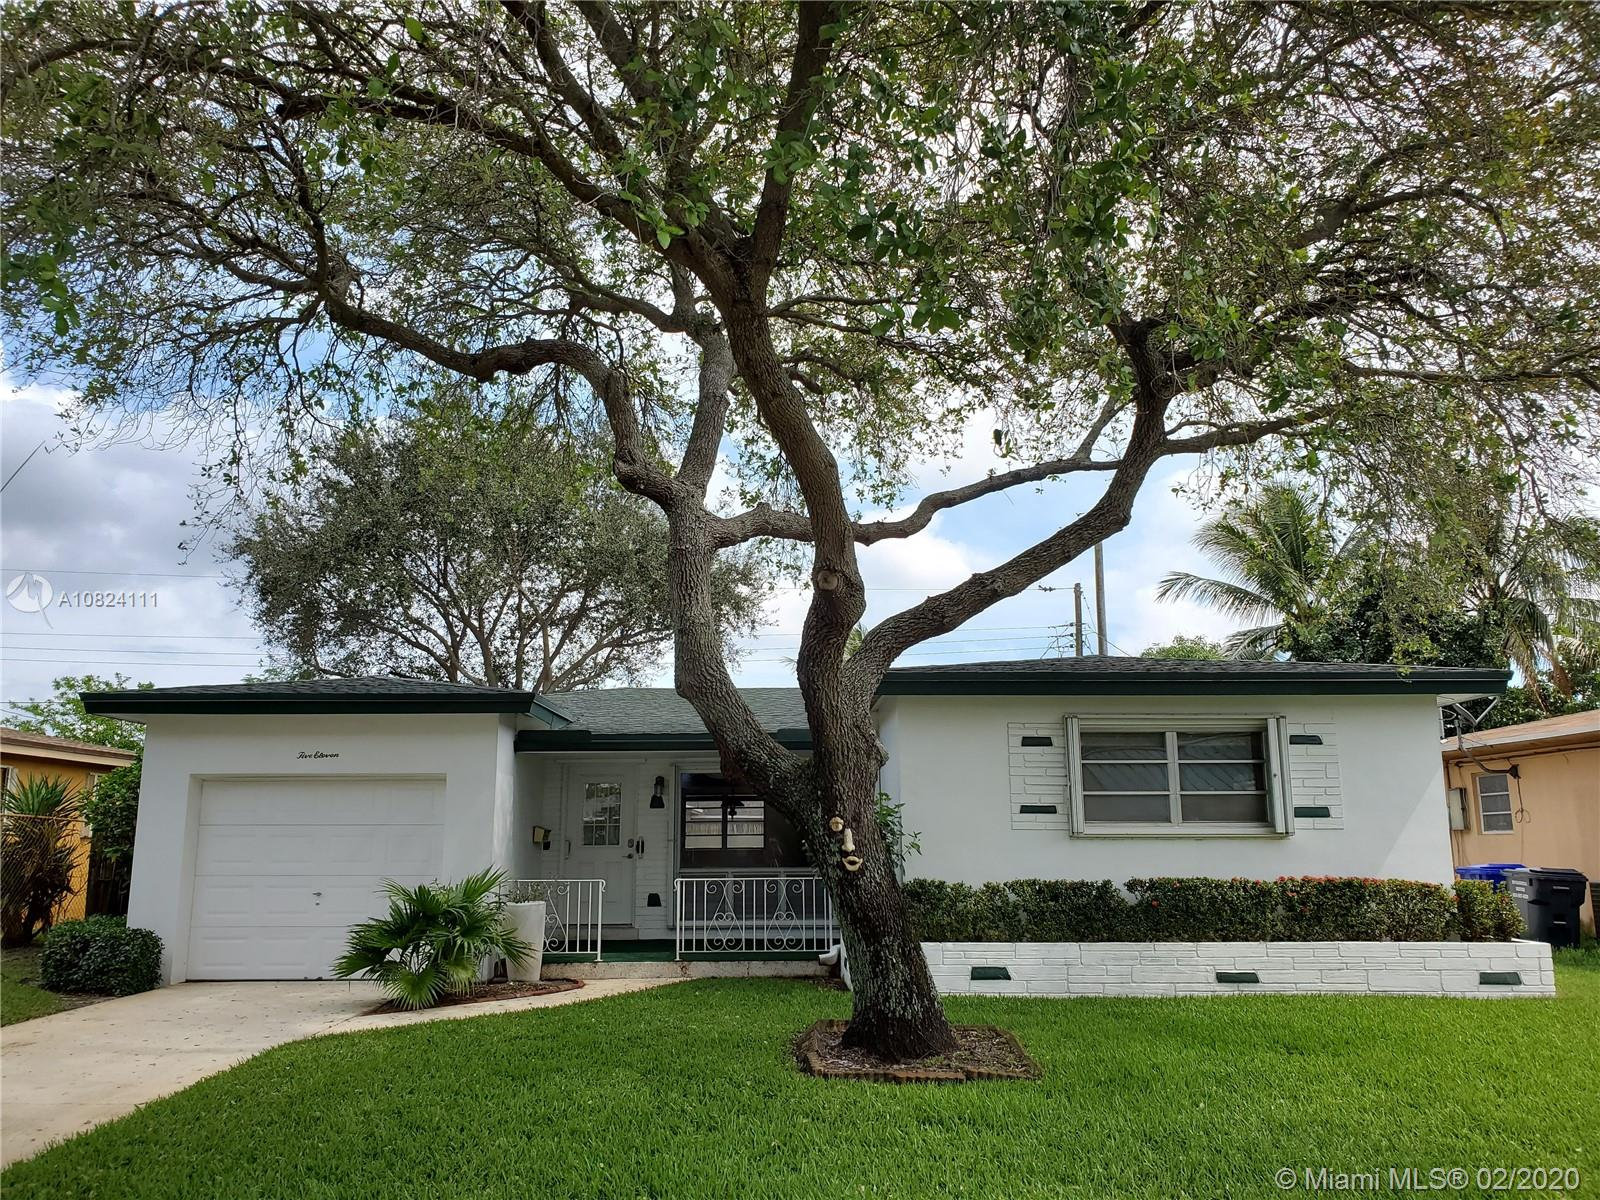 511 N 71st Ter, Hollywood, FL 33024 - Hollywood, FL real estate listing